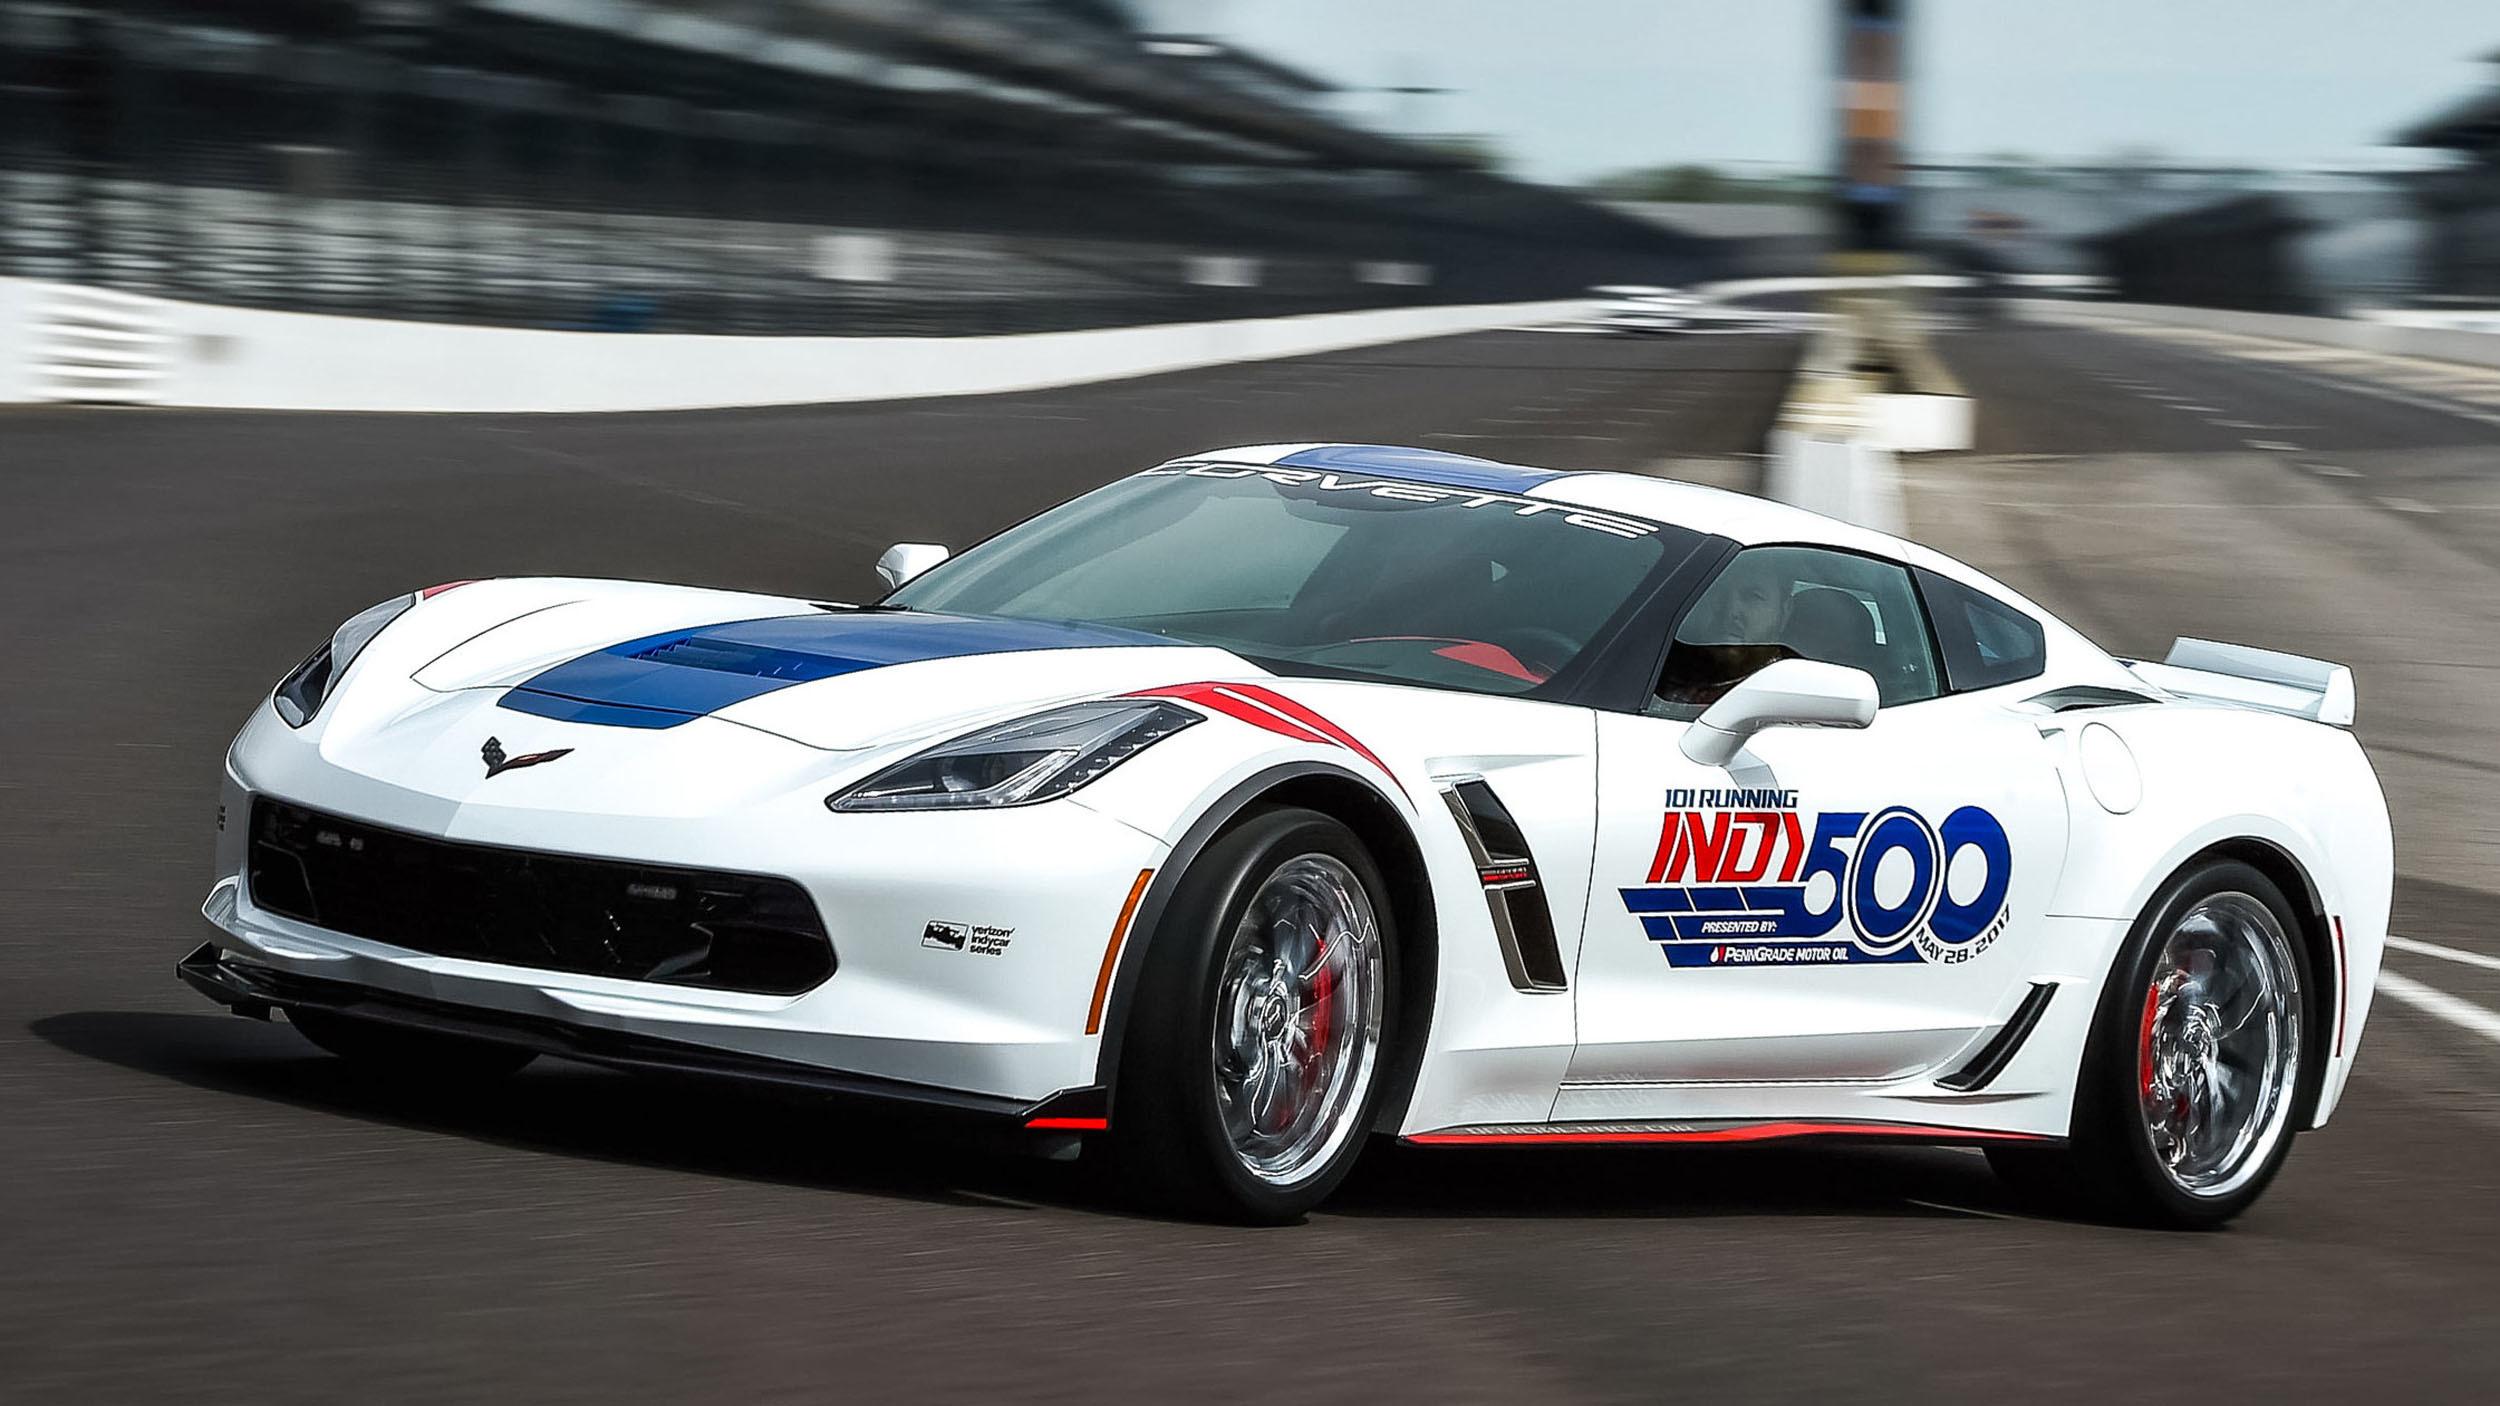 Chevrolet Corvette Grand Sport pace car Indy 500 (5)